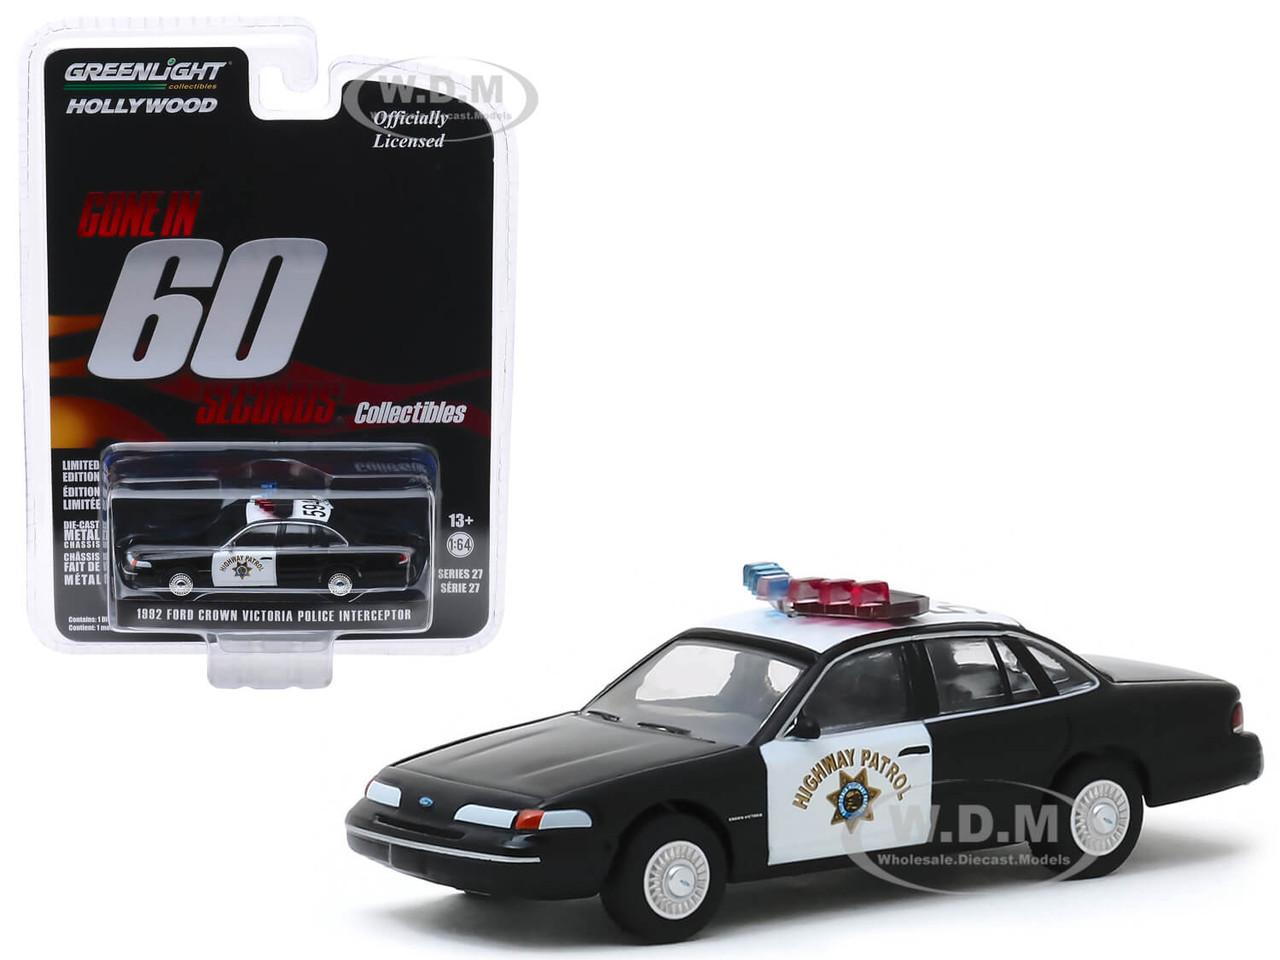 GREENLIGHT 86086 1:43 FORD CROWN VICTORIA CHP POLICE INTERCEPTOR CAR W// CASE